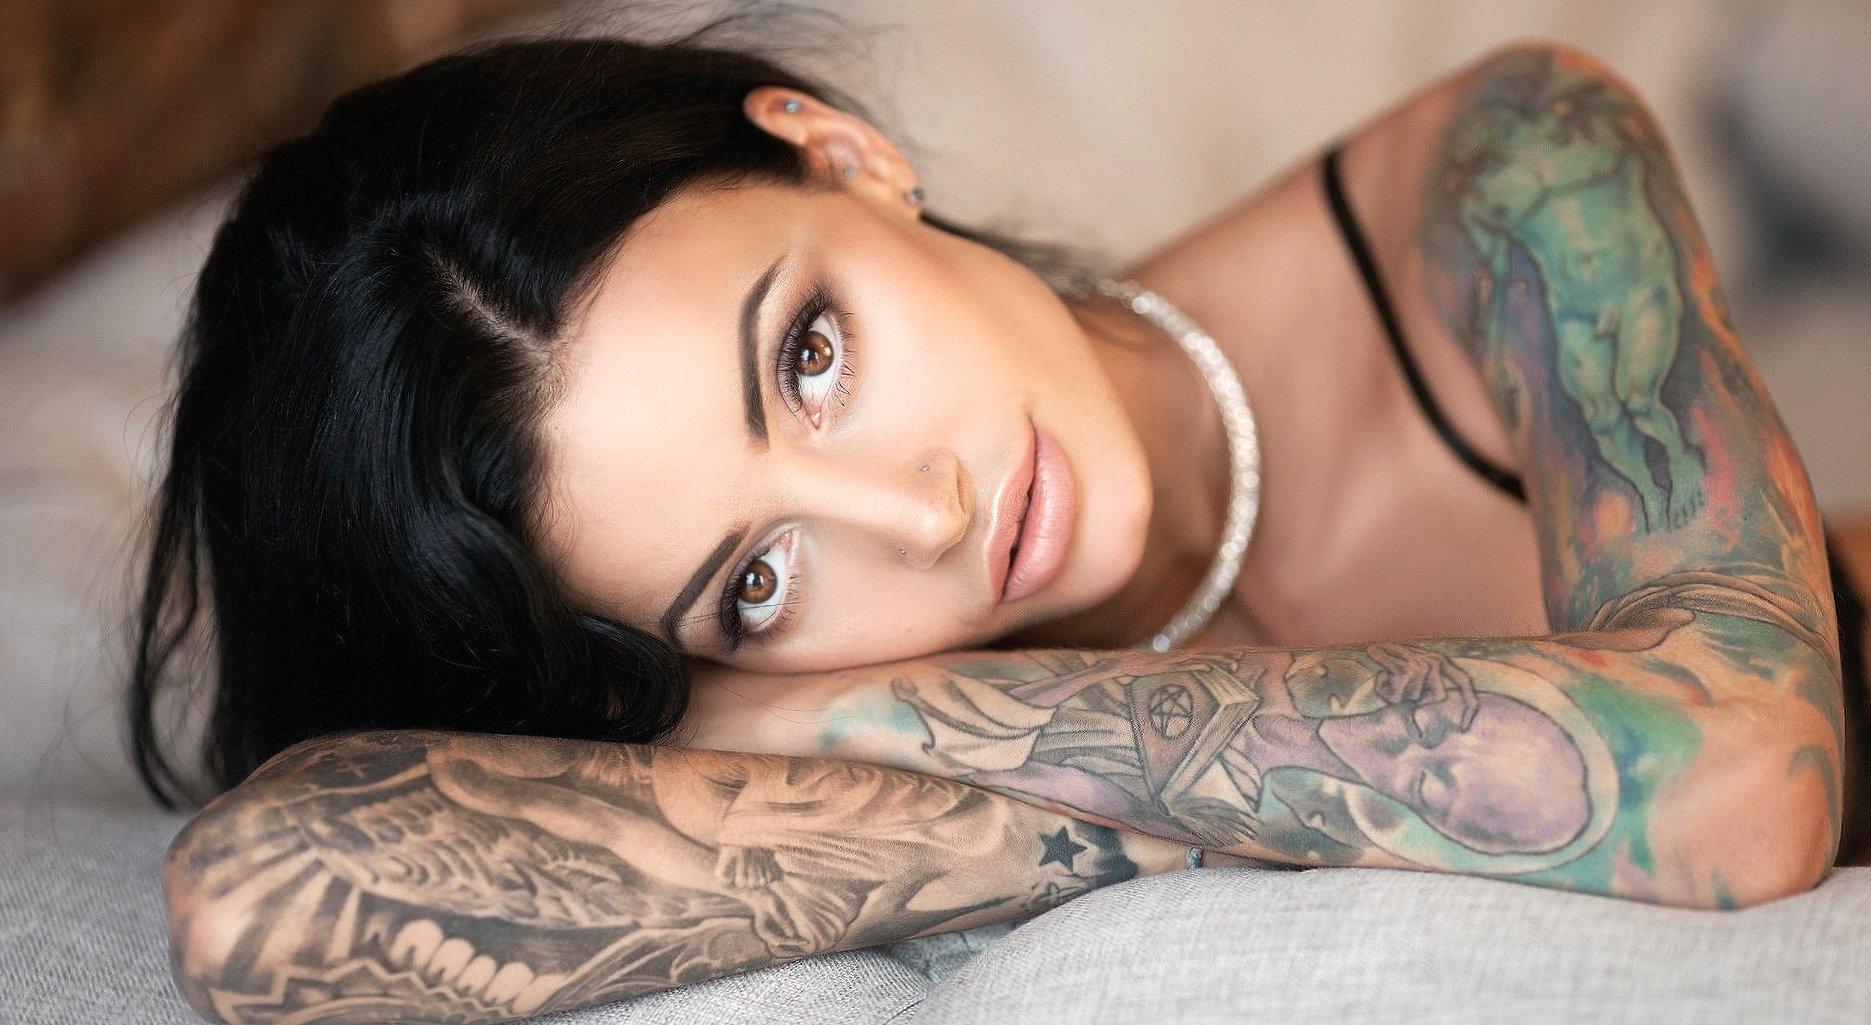 Tattoo wallpapers HD quality